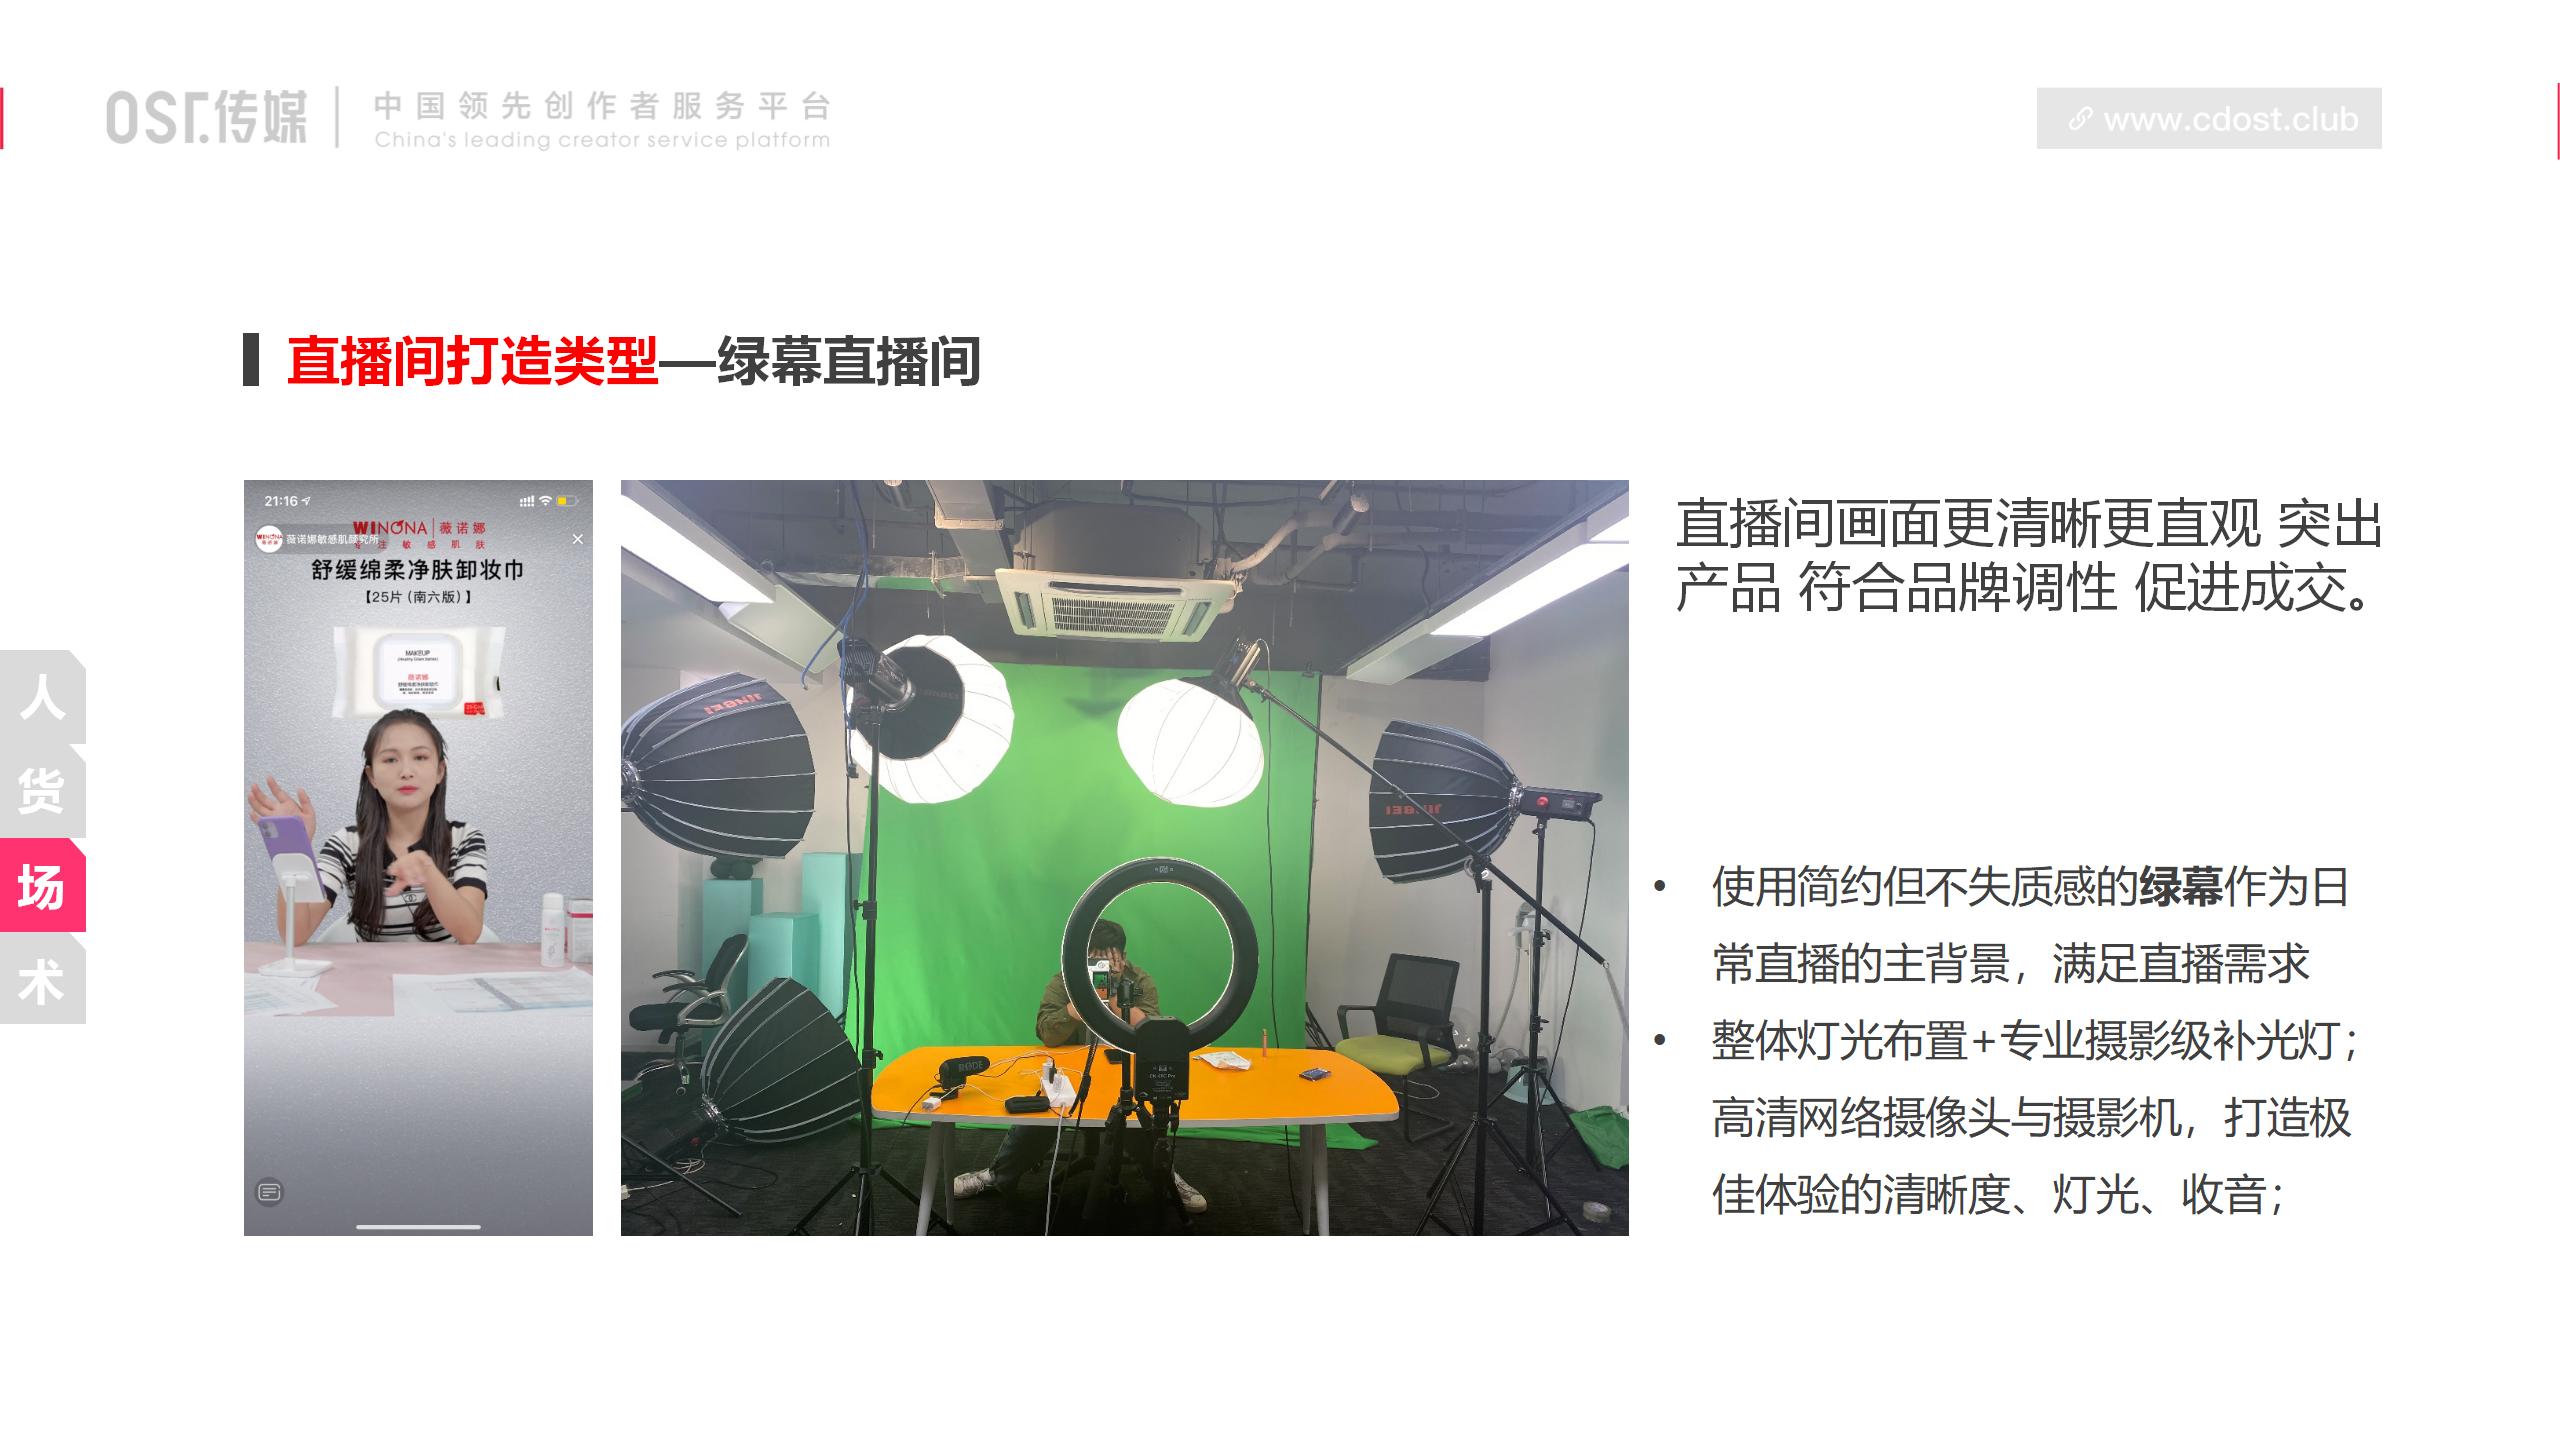 OST传媒电商业务介绍第19张